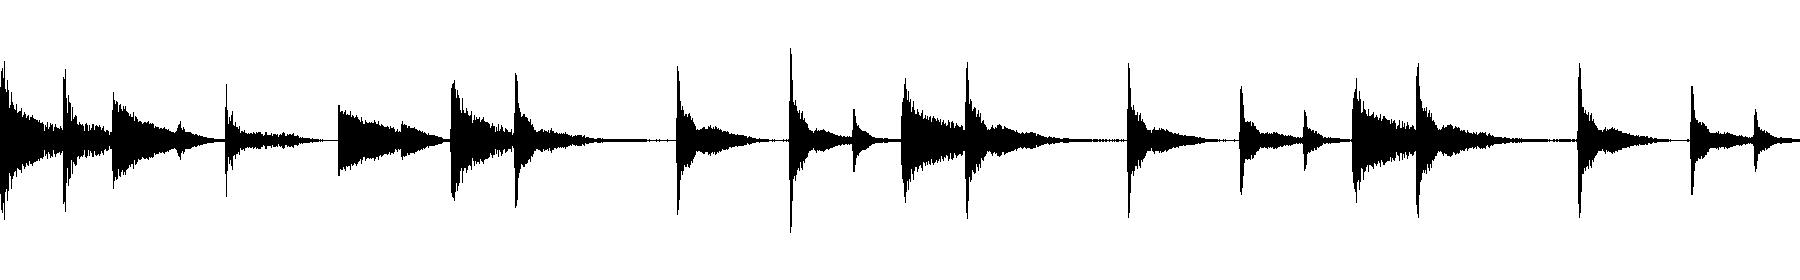 g abs05 083